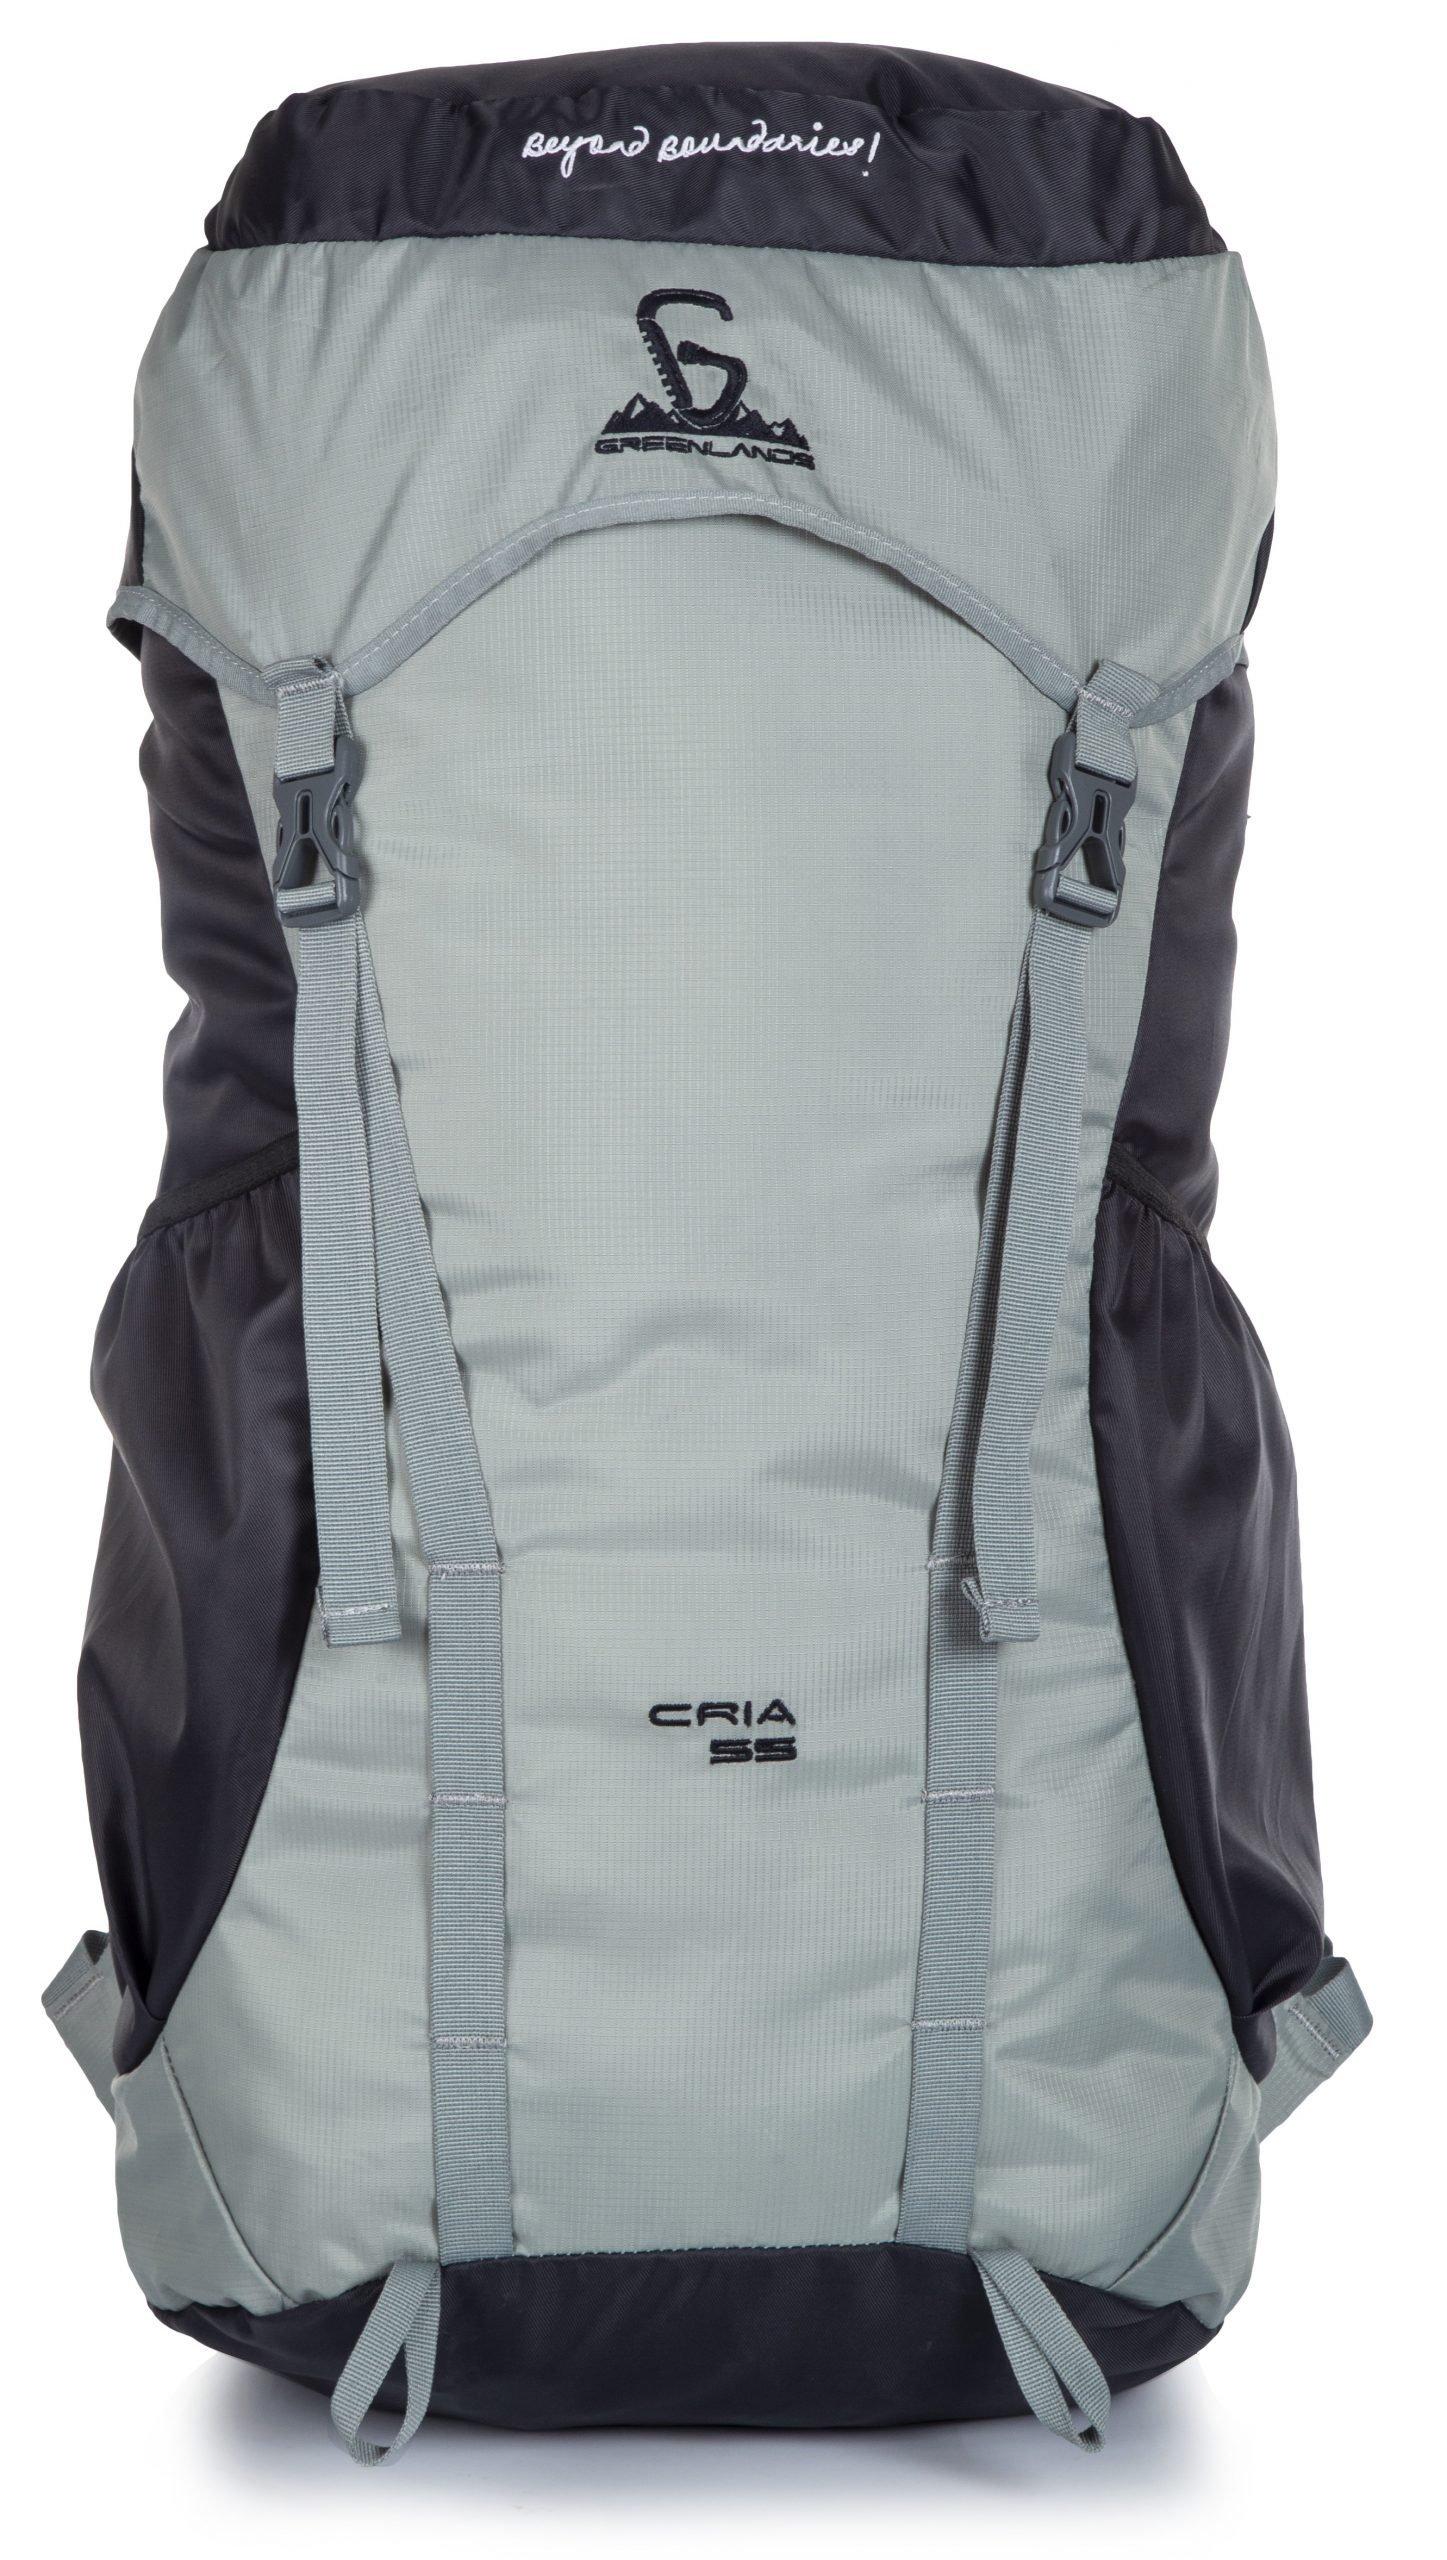 Greenlands Cria 55 grey rucksack